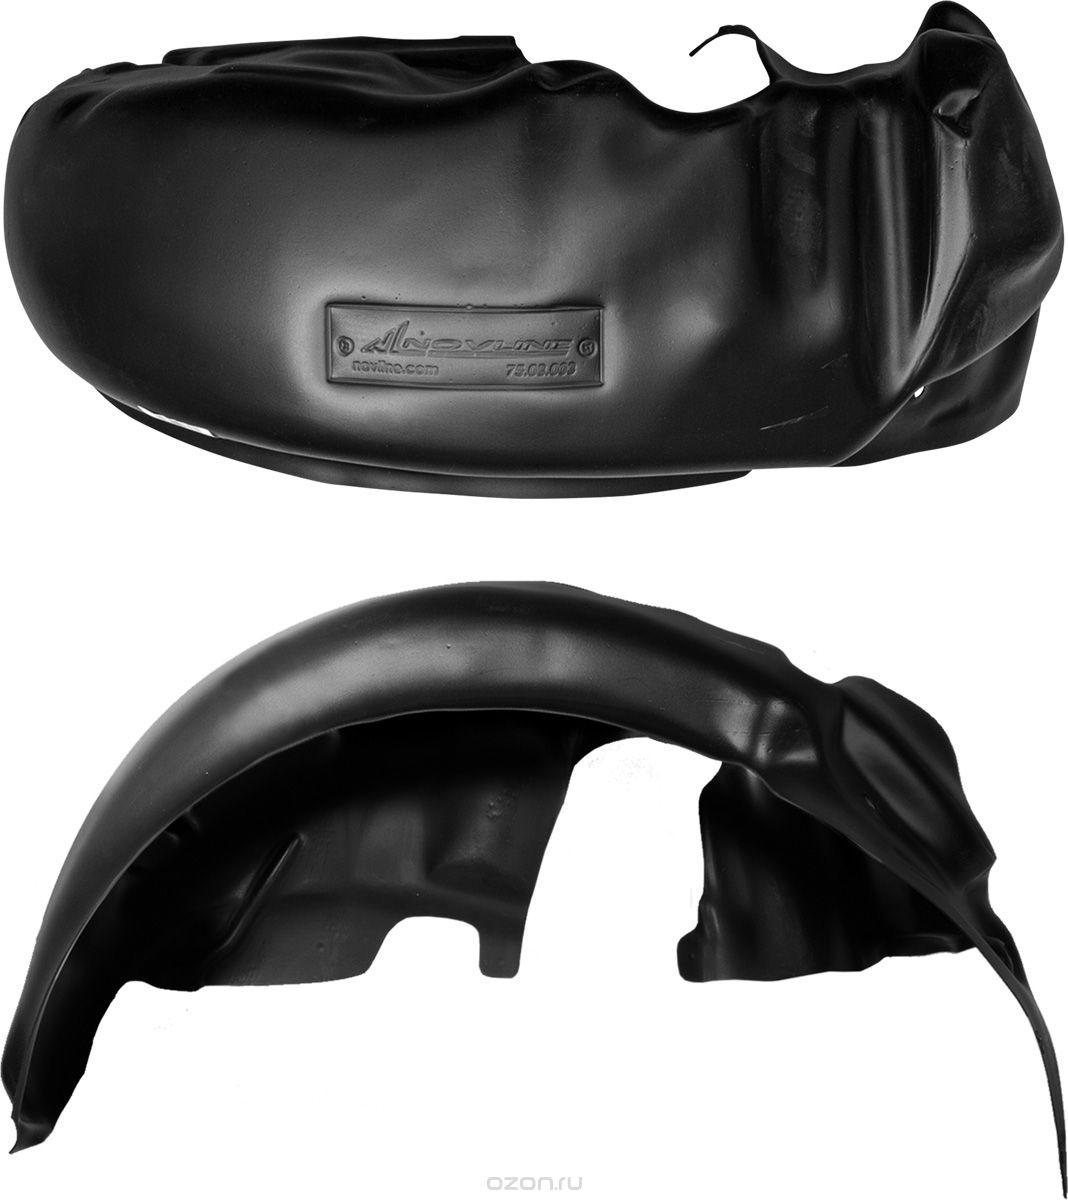 Подкрылок Novline-Autofamily, для ВАЗ 2105, 07, 1982-2010, б/б, задний левый подкрылок novline autofamily для ваз 2115 1997 2012 б б задний левый